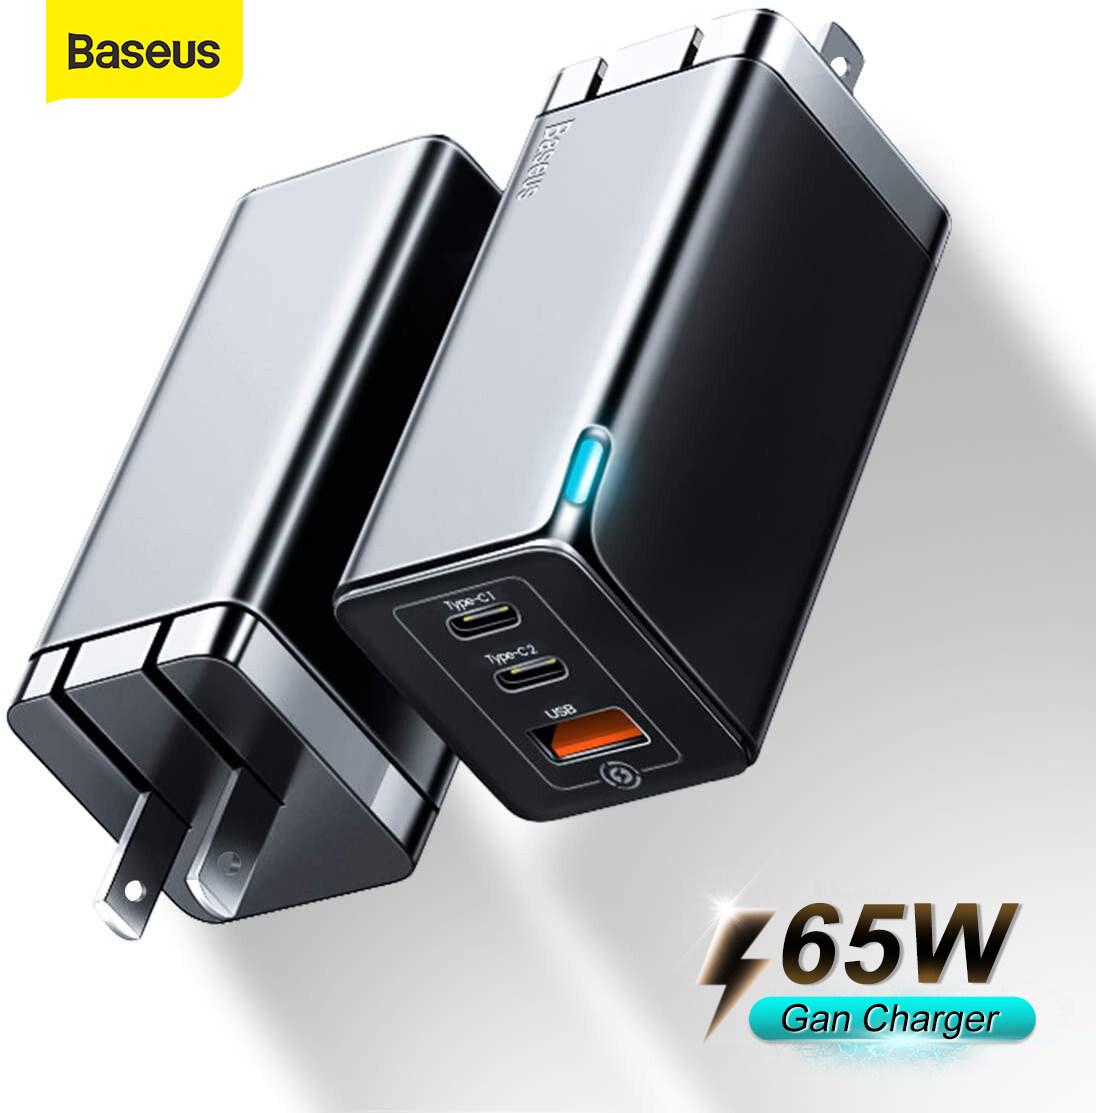 Baseus หัวชาร์จเร็ว 65w Gan 2pro Usb Type C Fast Quick Charge Adapter หัวชาร์จไอโฟน อุปกรณ์ชาร์จมือถือ Samsung Iphone.